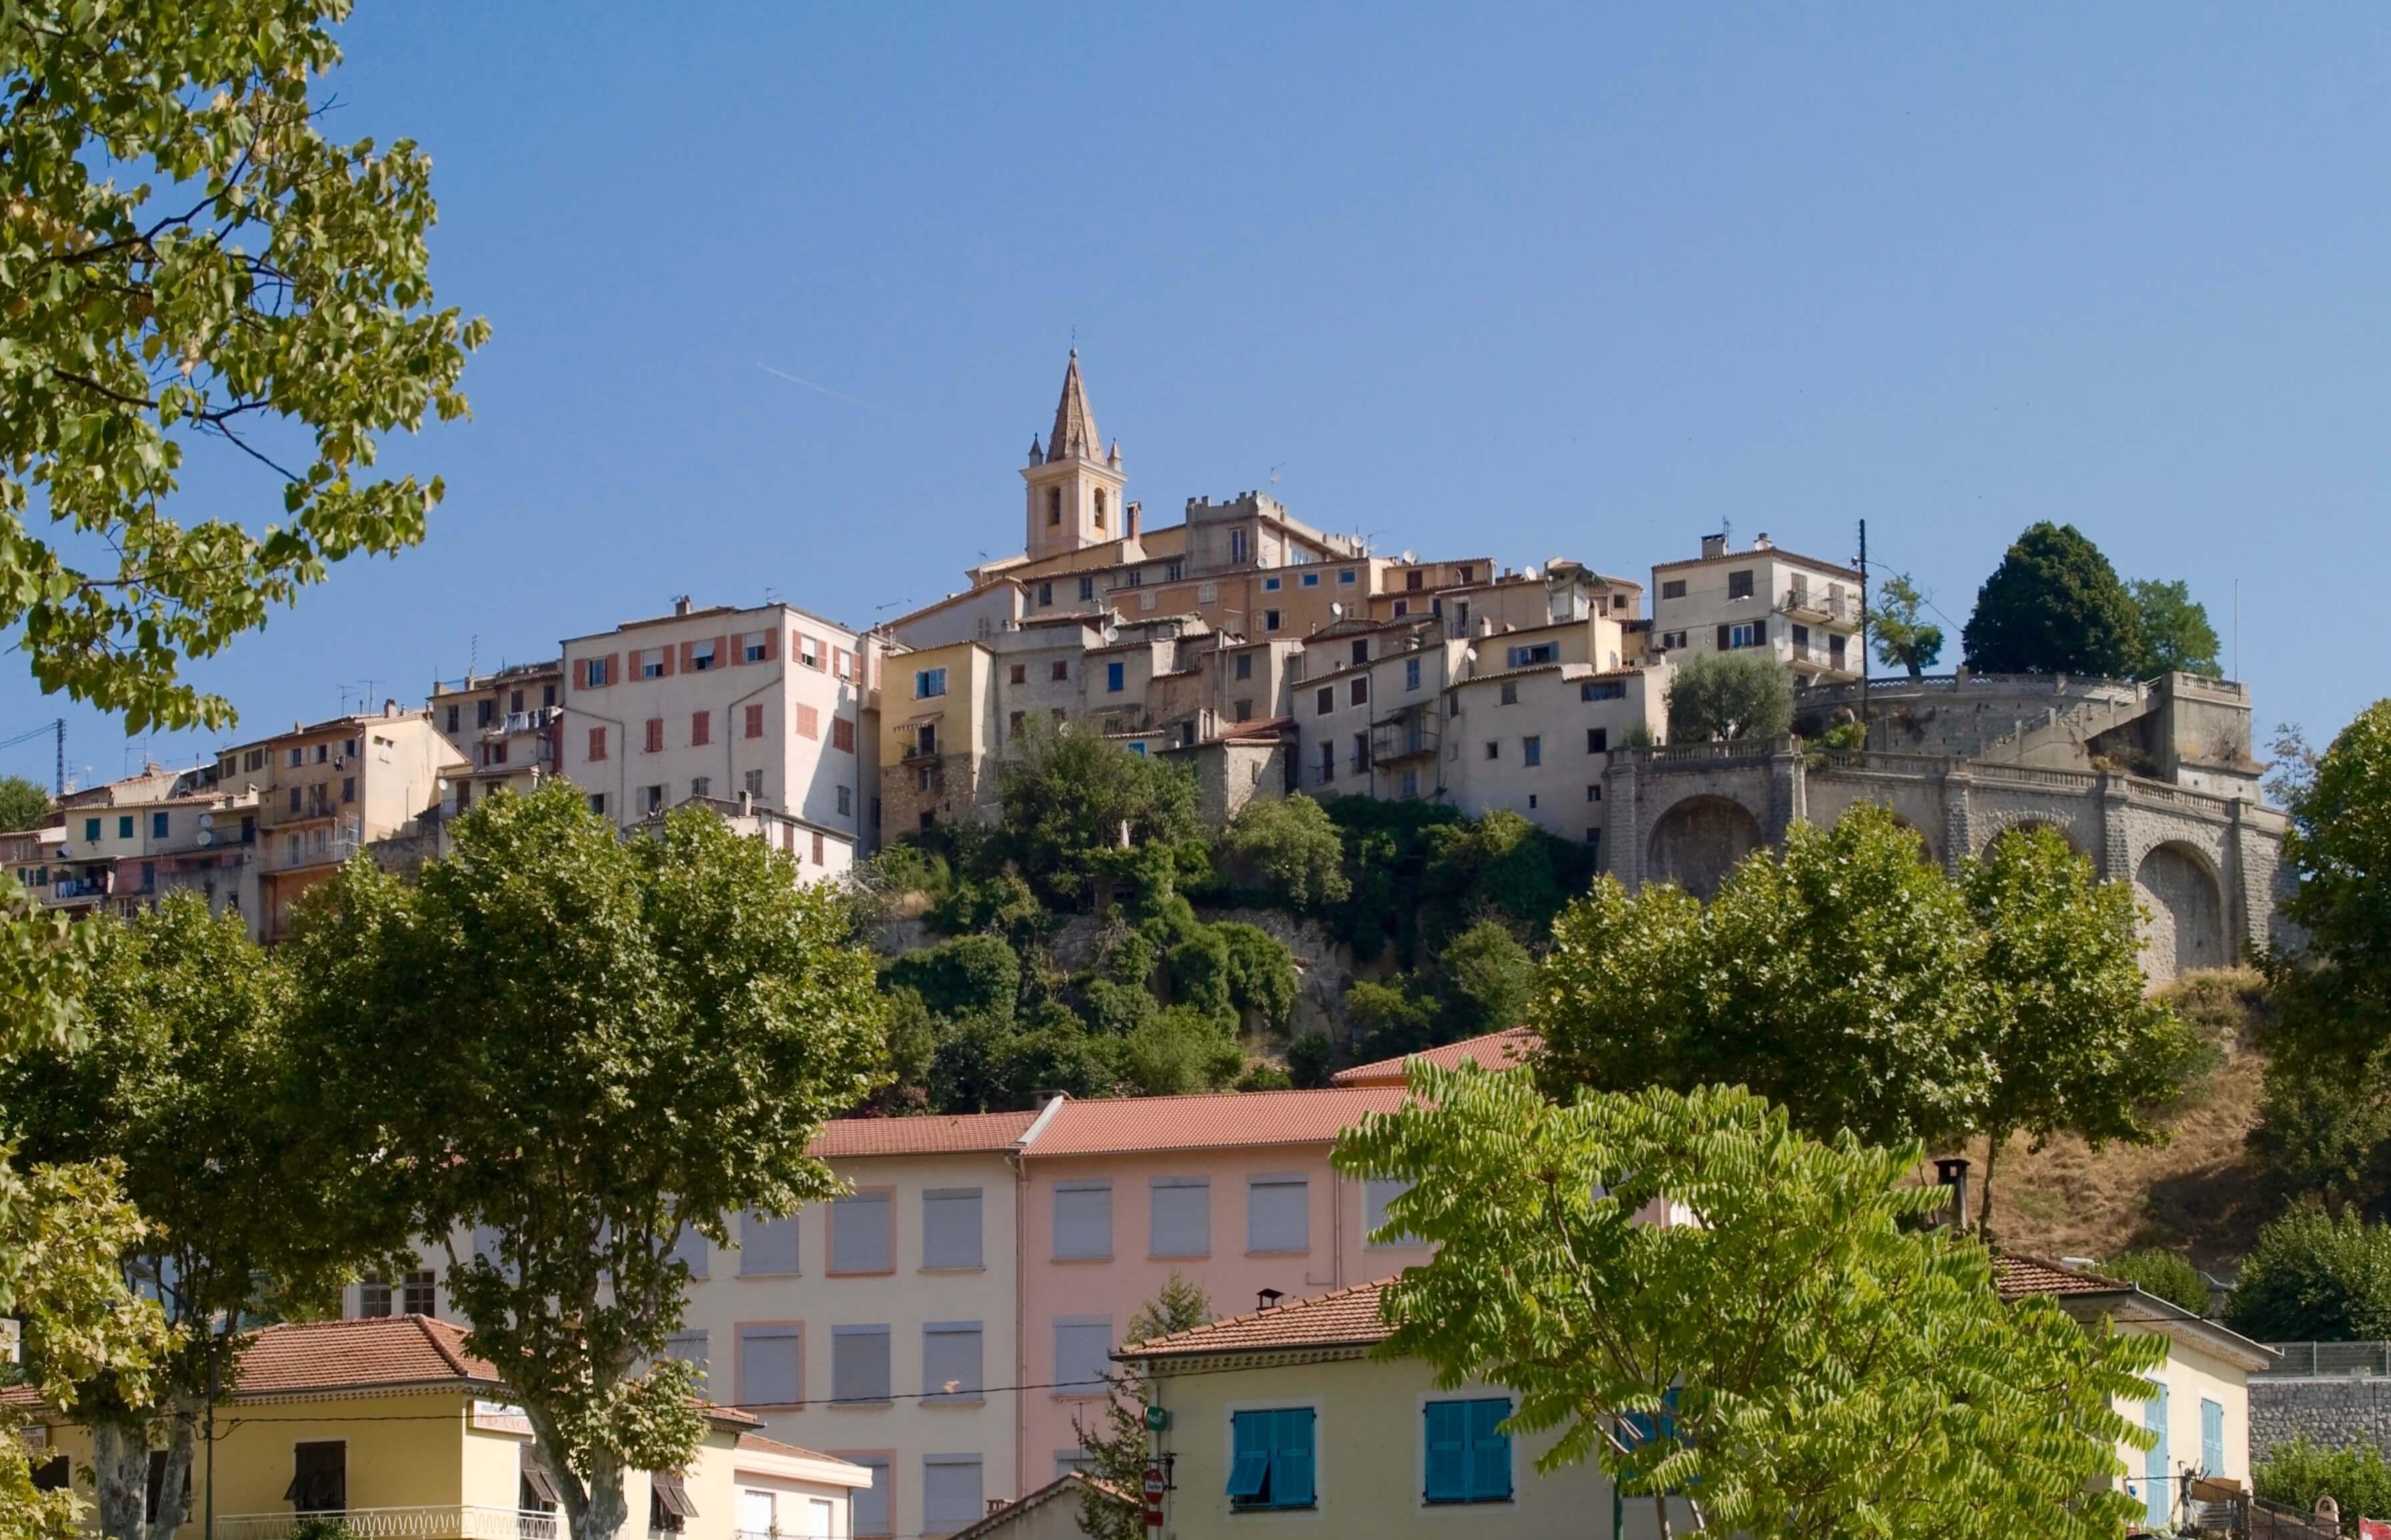 Village of Contes Alpes Maritimes France